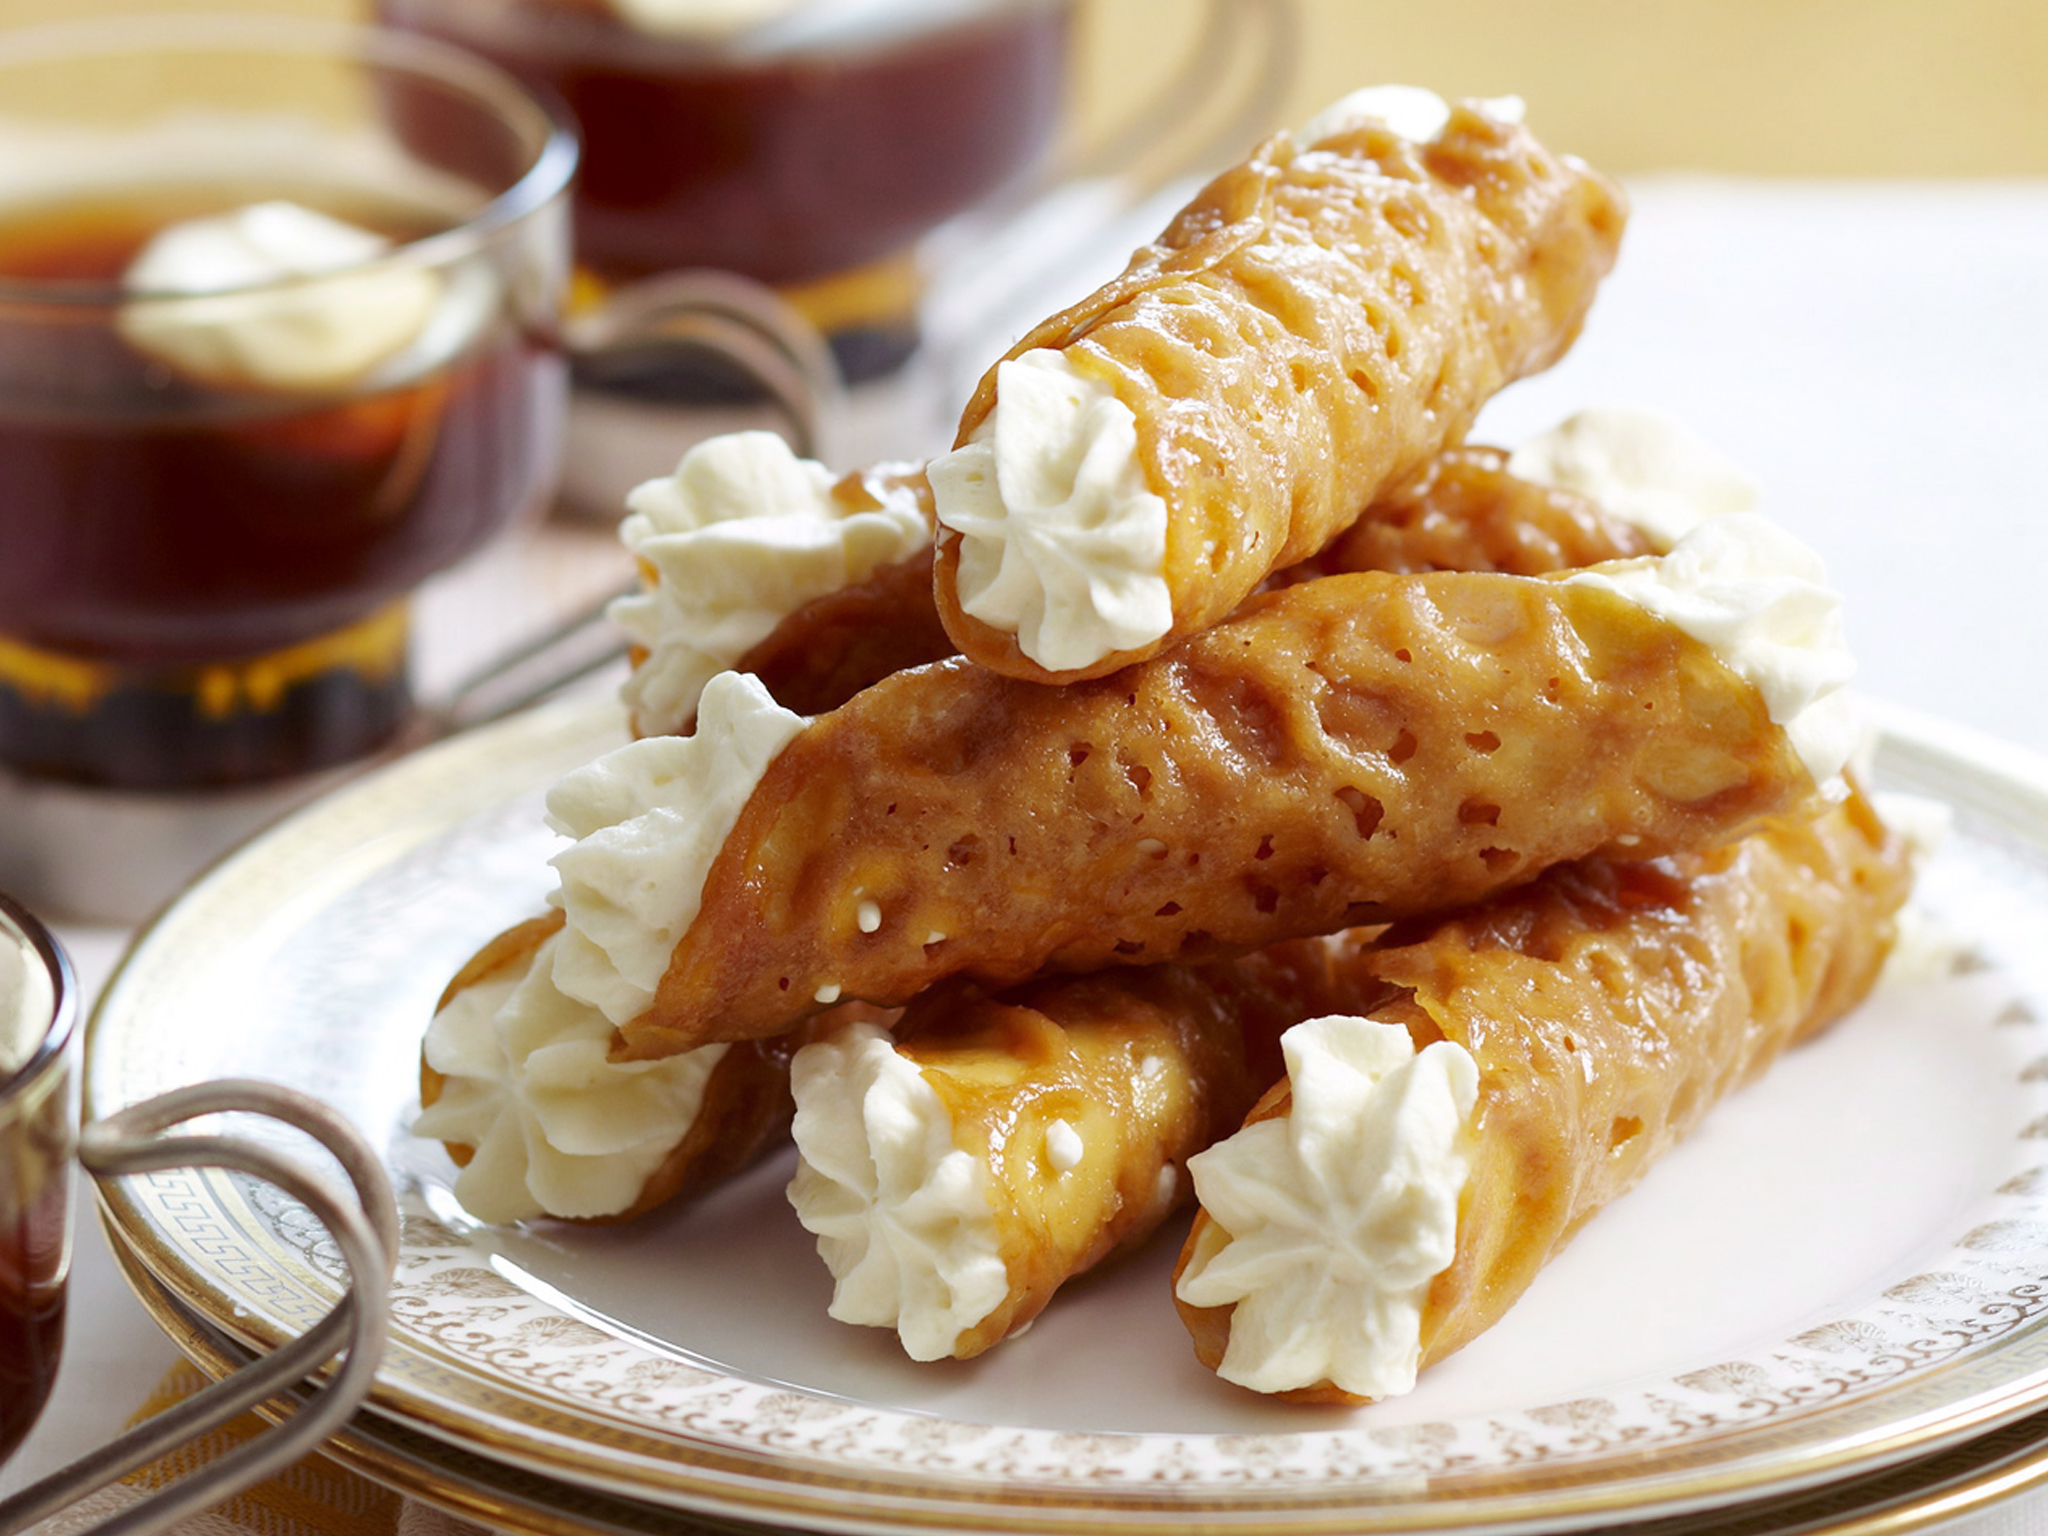 Everyday Food - Retro Food - Retro Dinner Party - Brandy Snaps